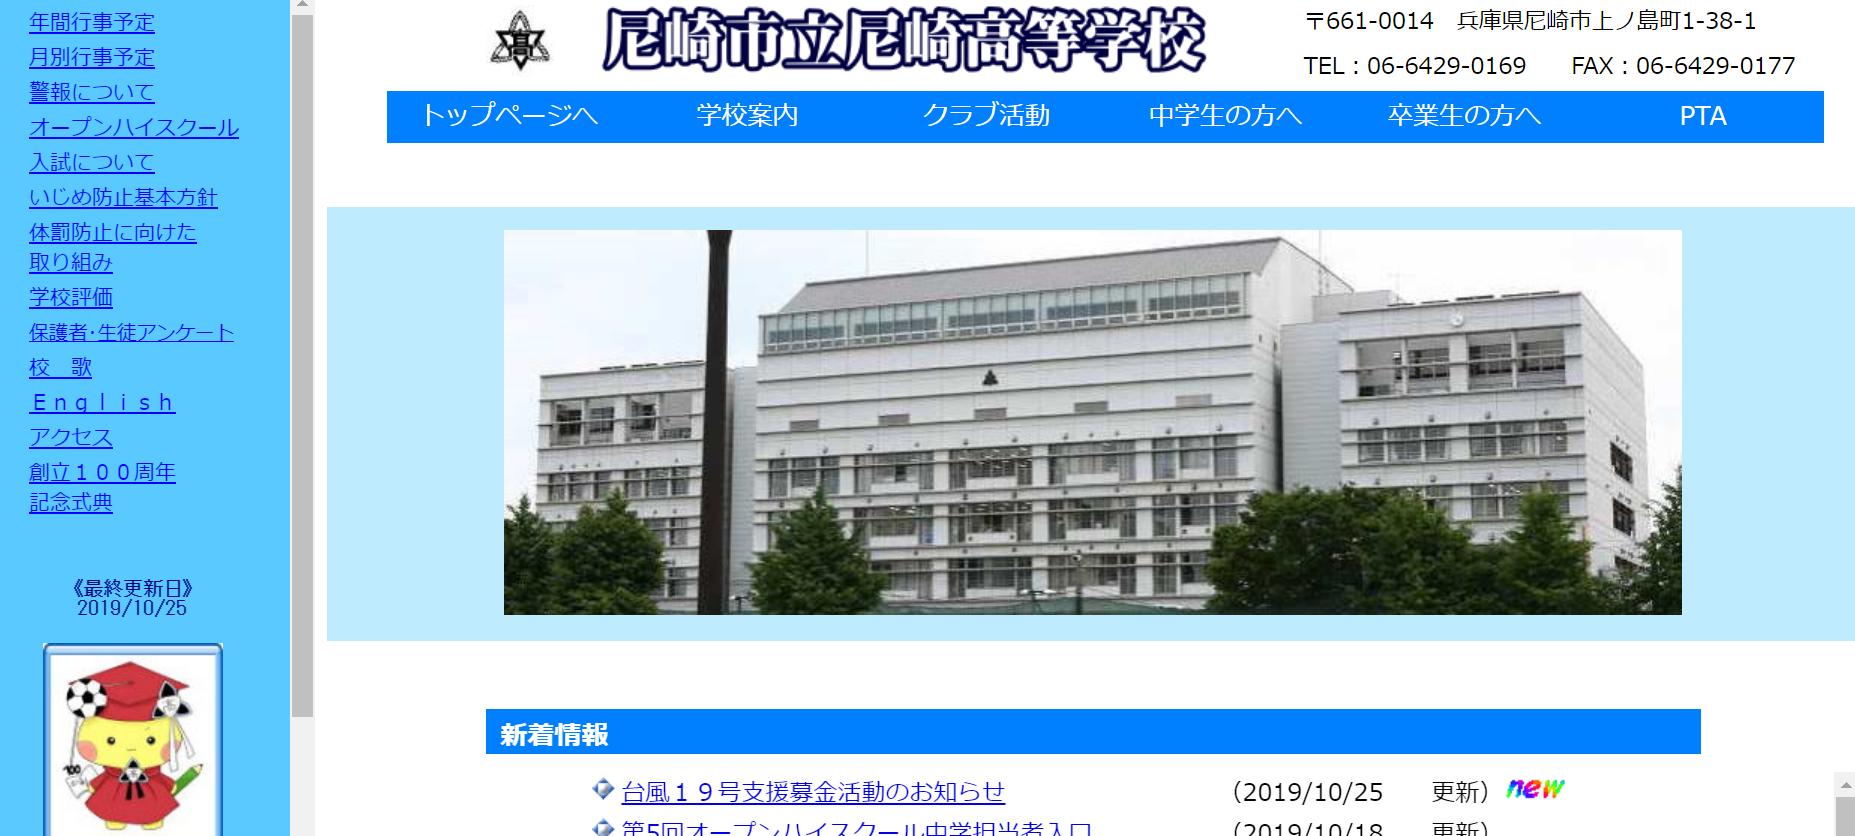 尼崎市立尼崎高校の口コミ・評判